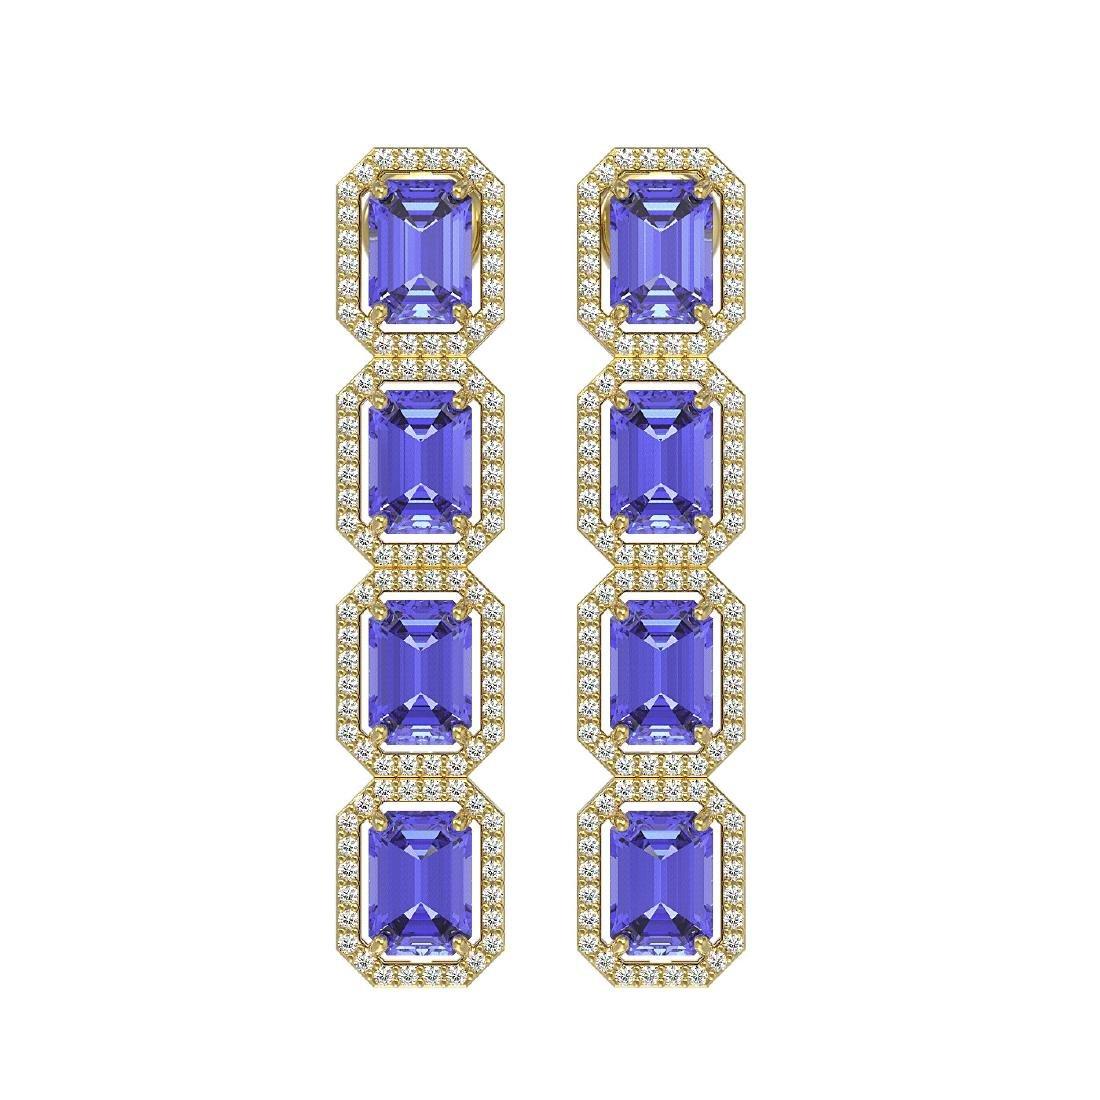 11.93 CTW Tanzanite & Diamond Halo Earrings 10K Yellow